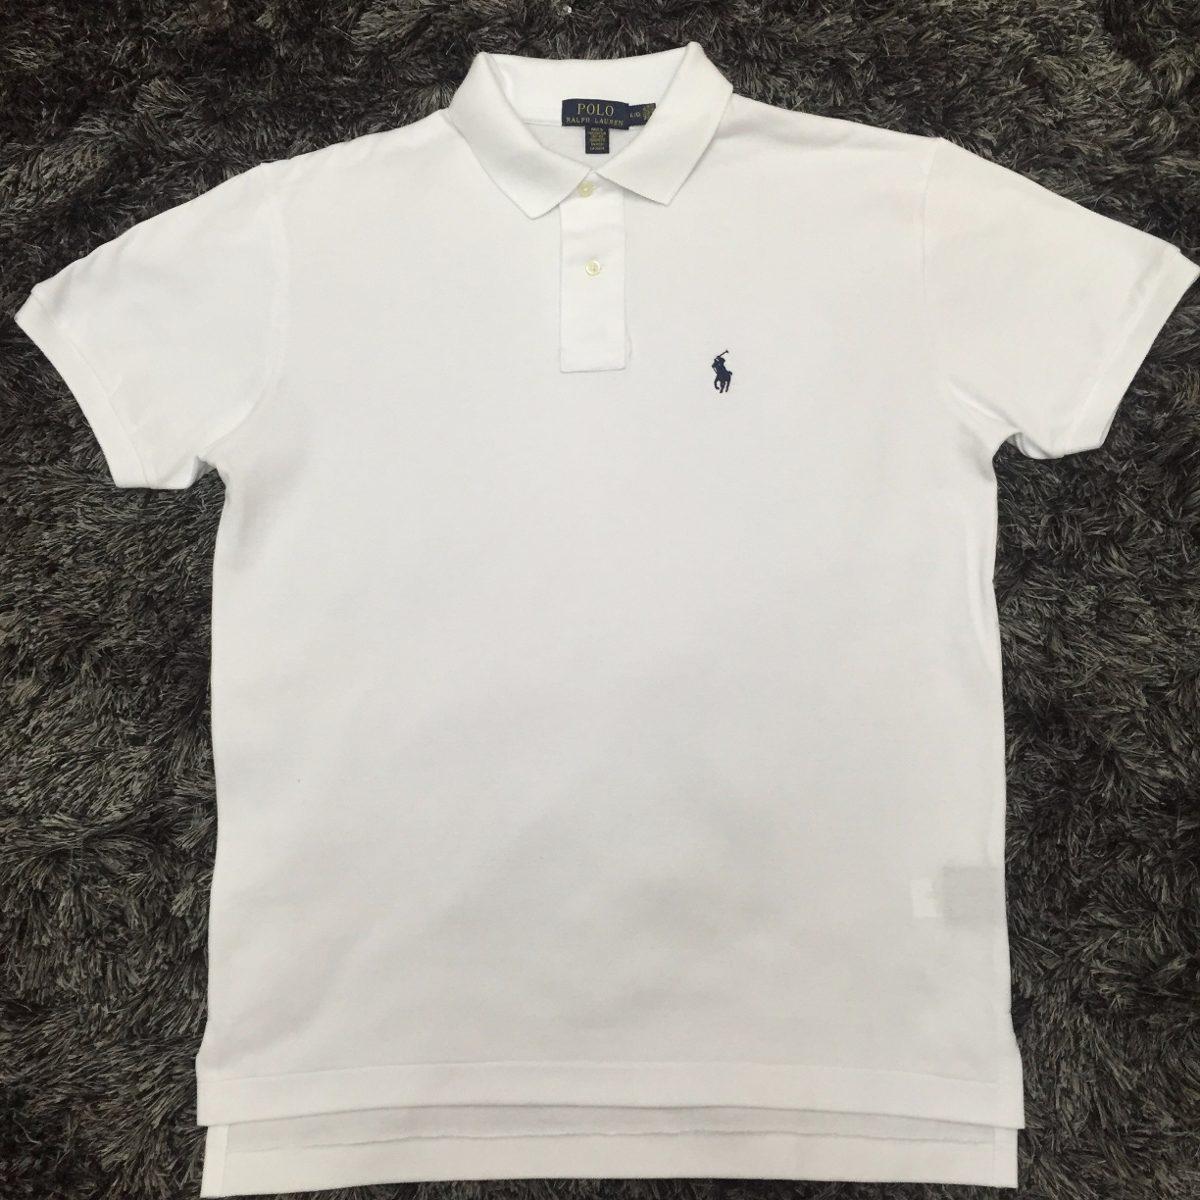 Kit 10 Camisetas Polo Ralph Lauren  d784ccd7f9f